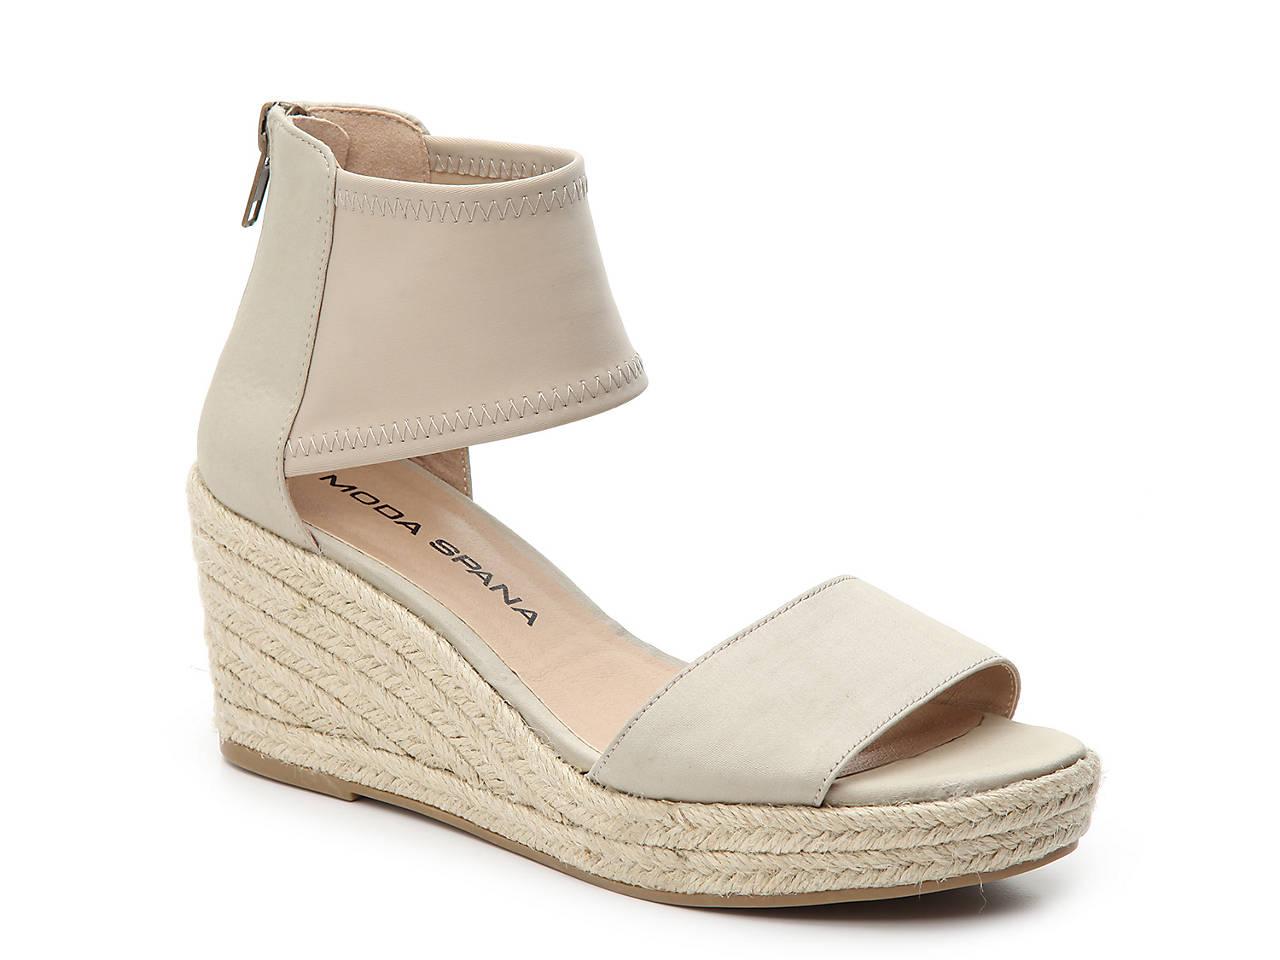 c27ca1c951a4 Moda Spana Kacy Espadrille Wedge Sandal Women s Shoes